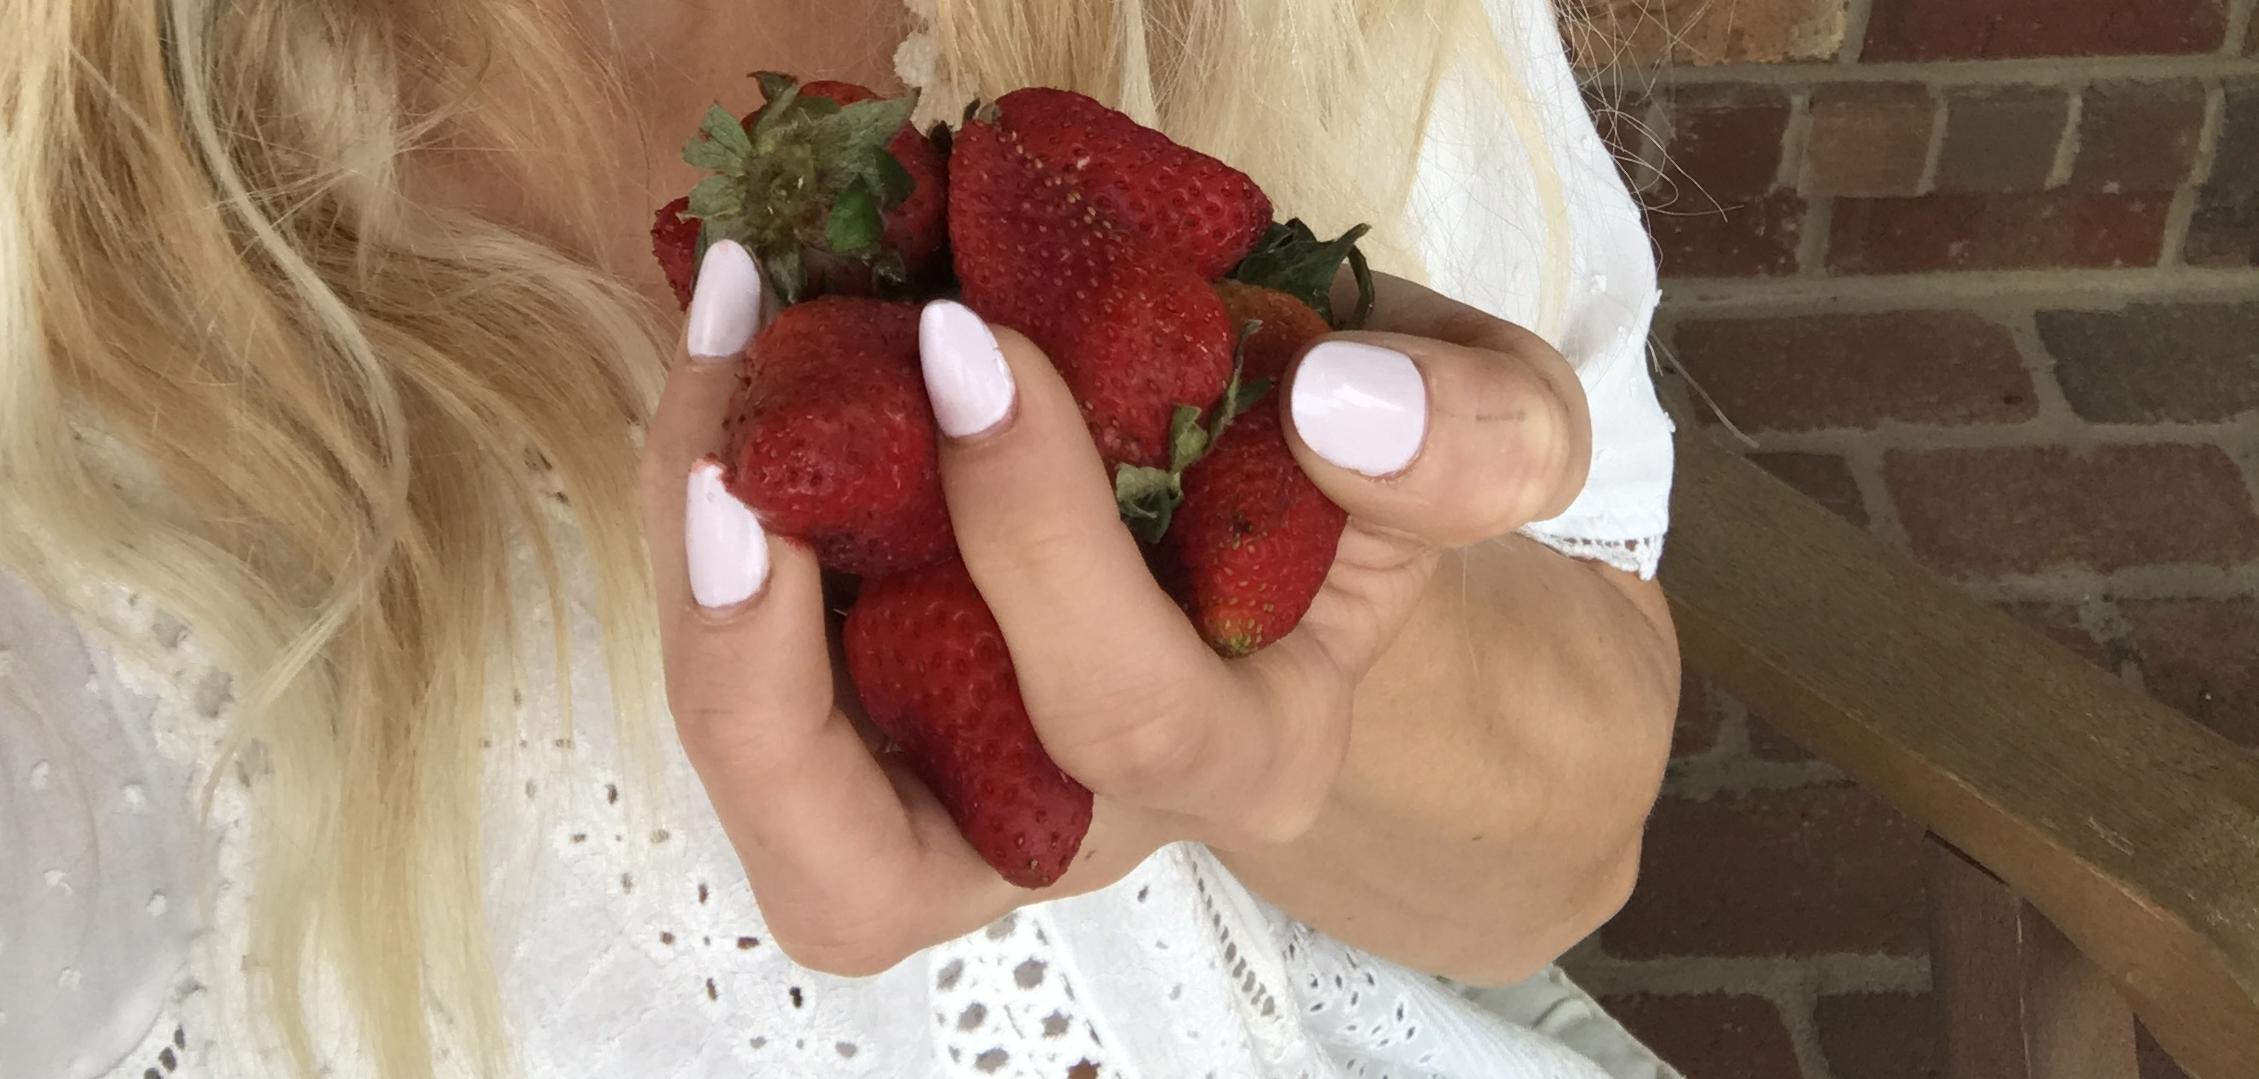 strawberryselfie.jpg